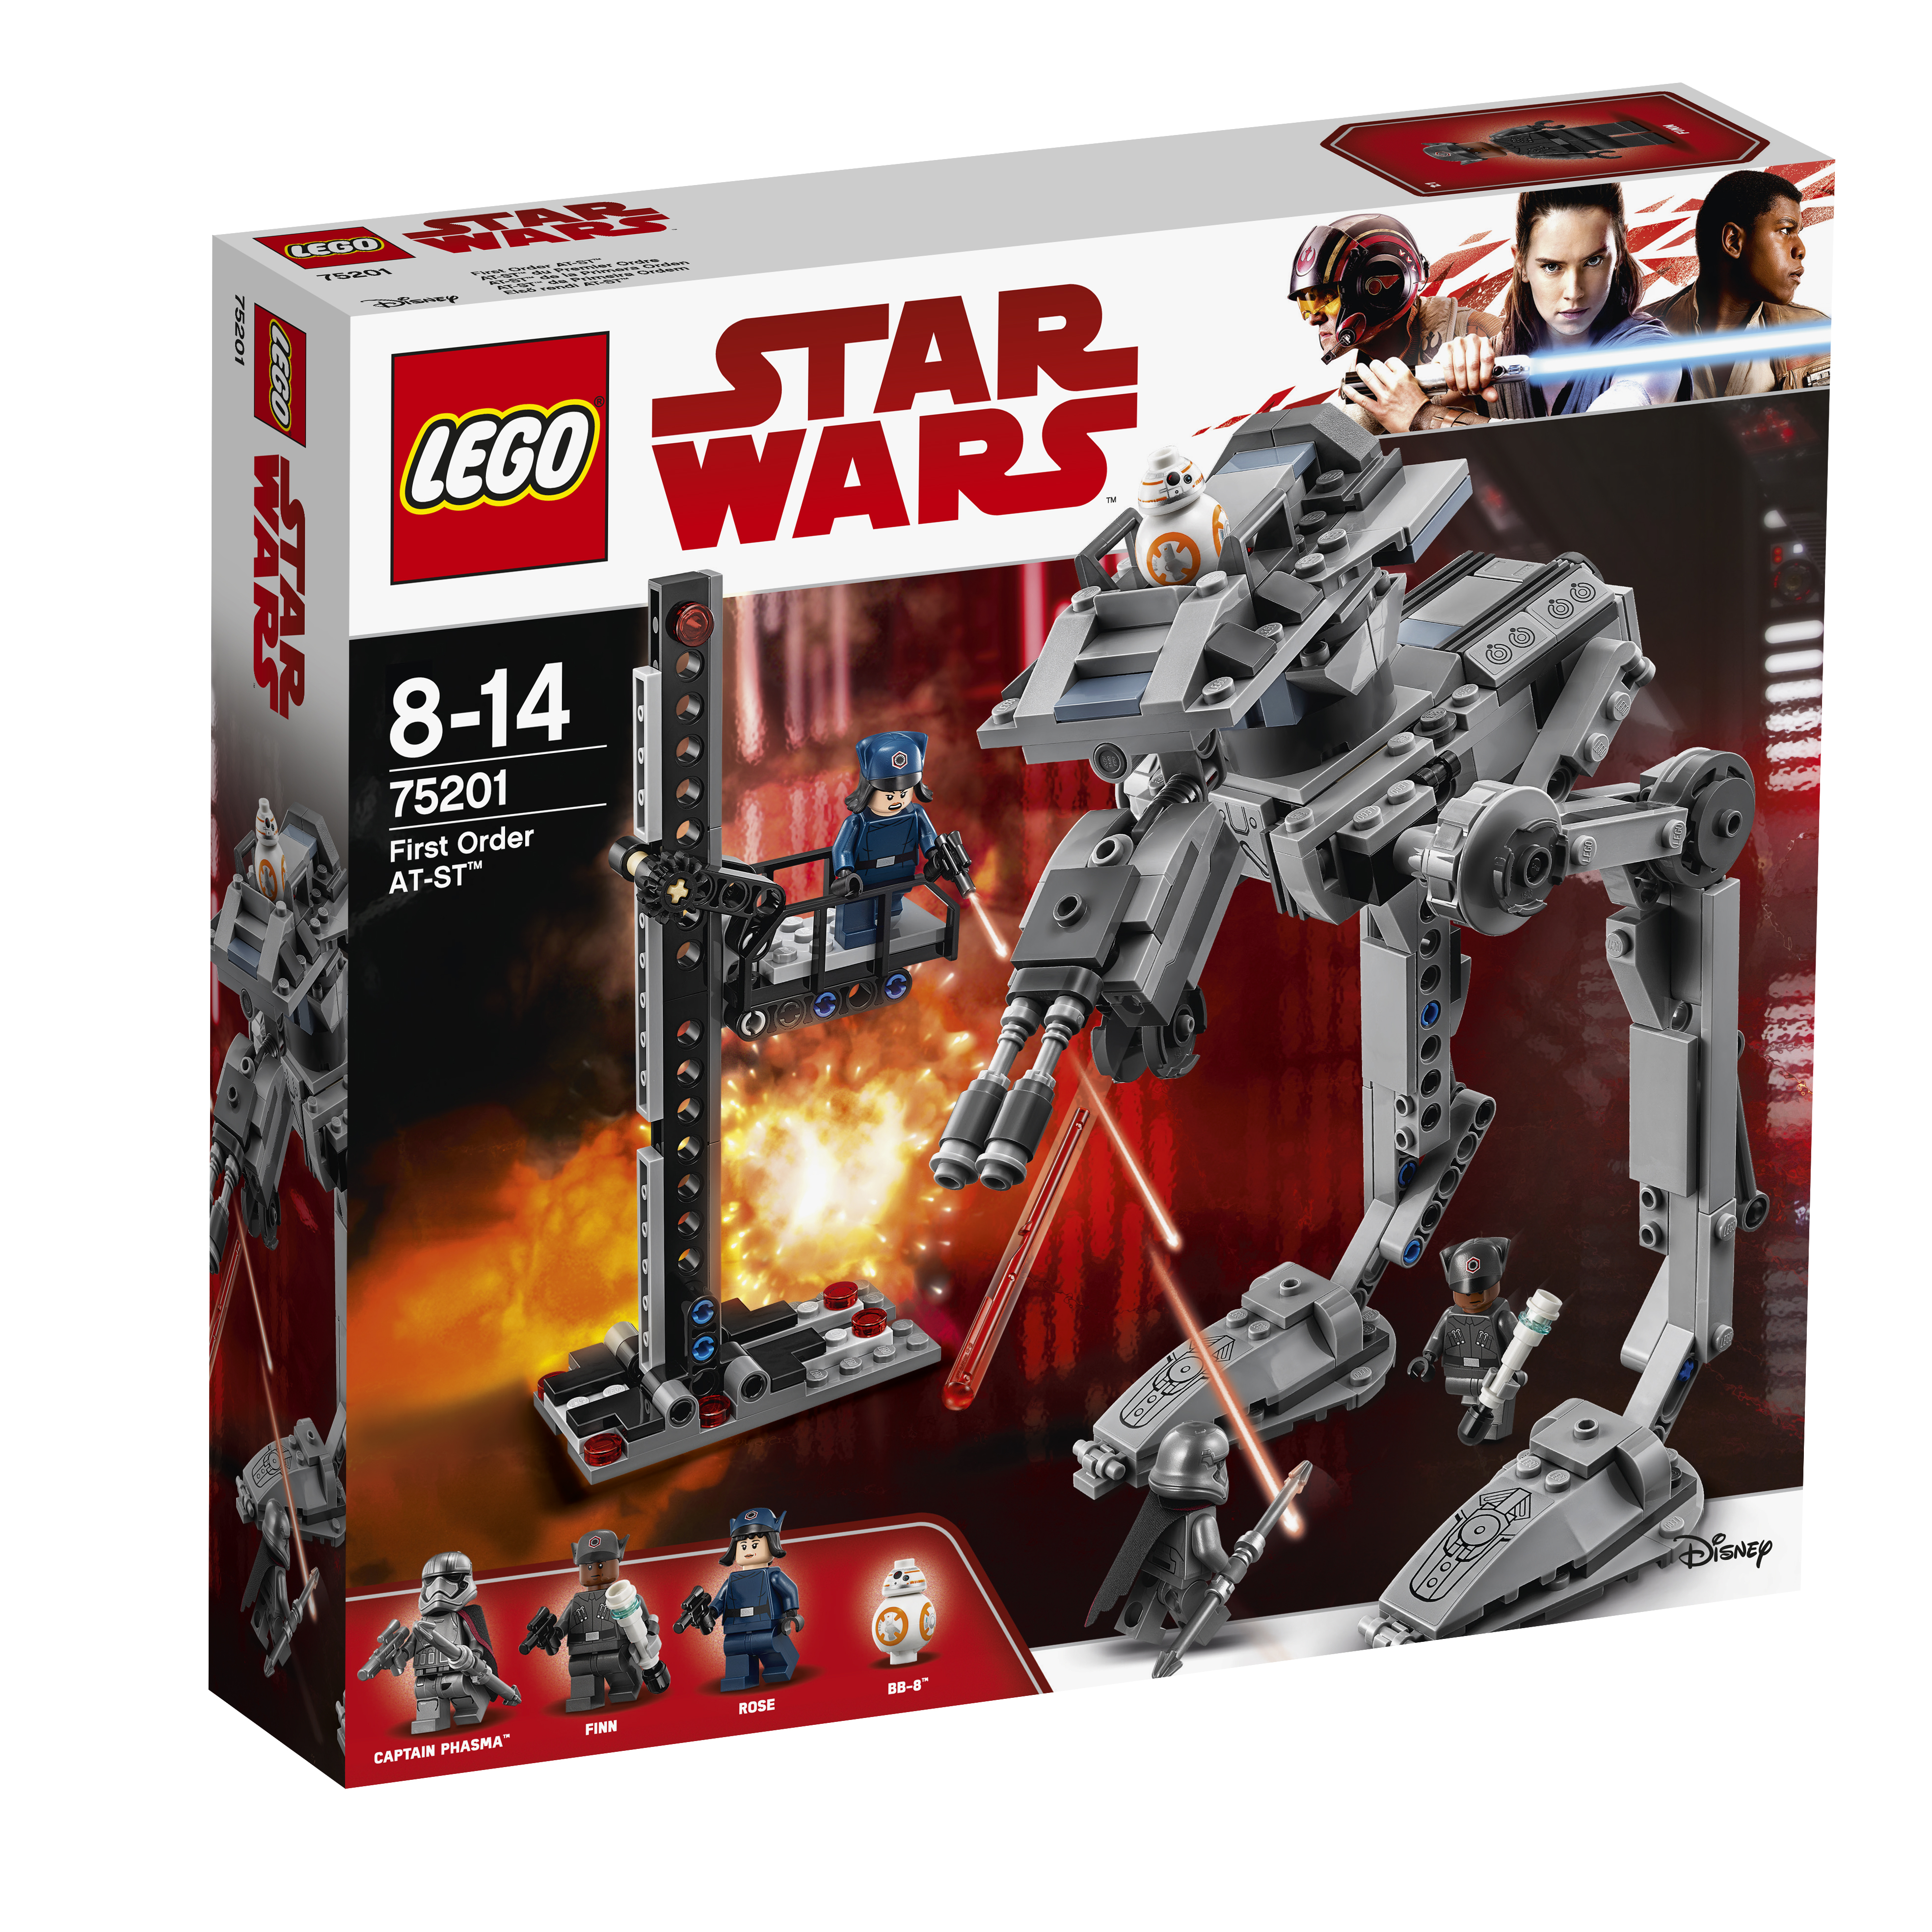 Star Wars LEGO 75201 Вездеход AT-ST Первого Ордена конструктор lego star wars шагающий штурмовой вездеход at te капитана рекса 75157